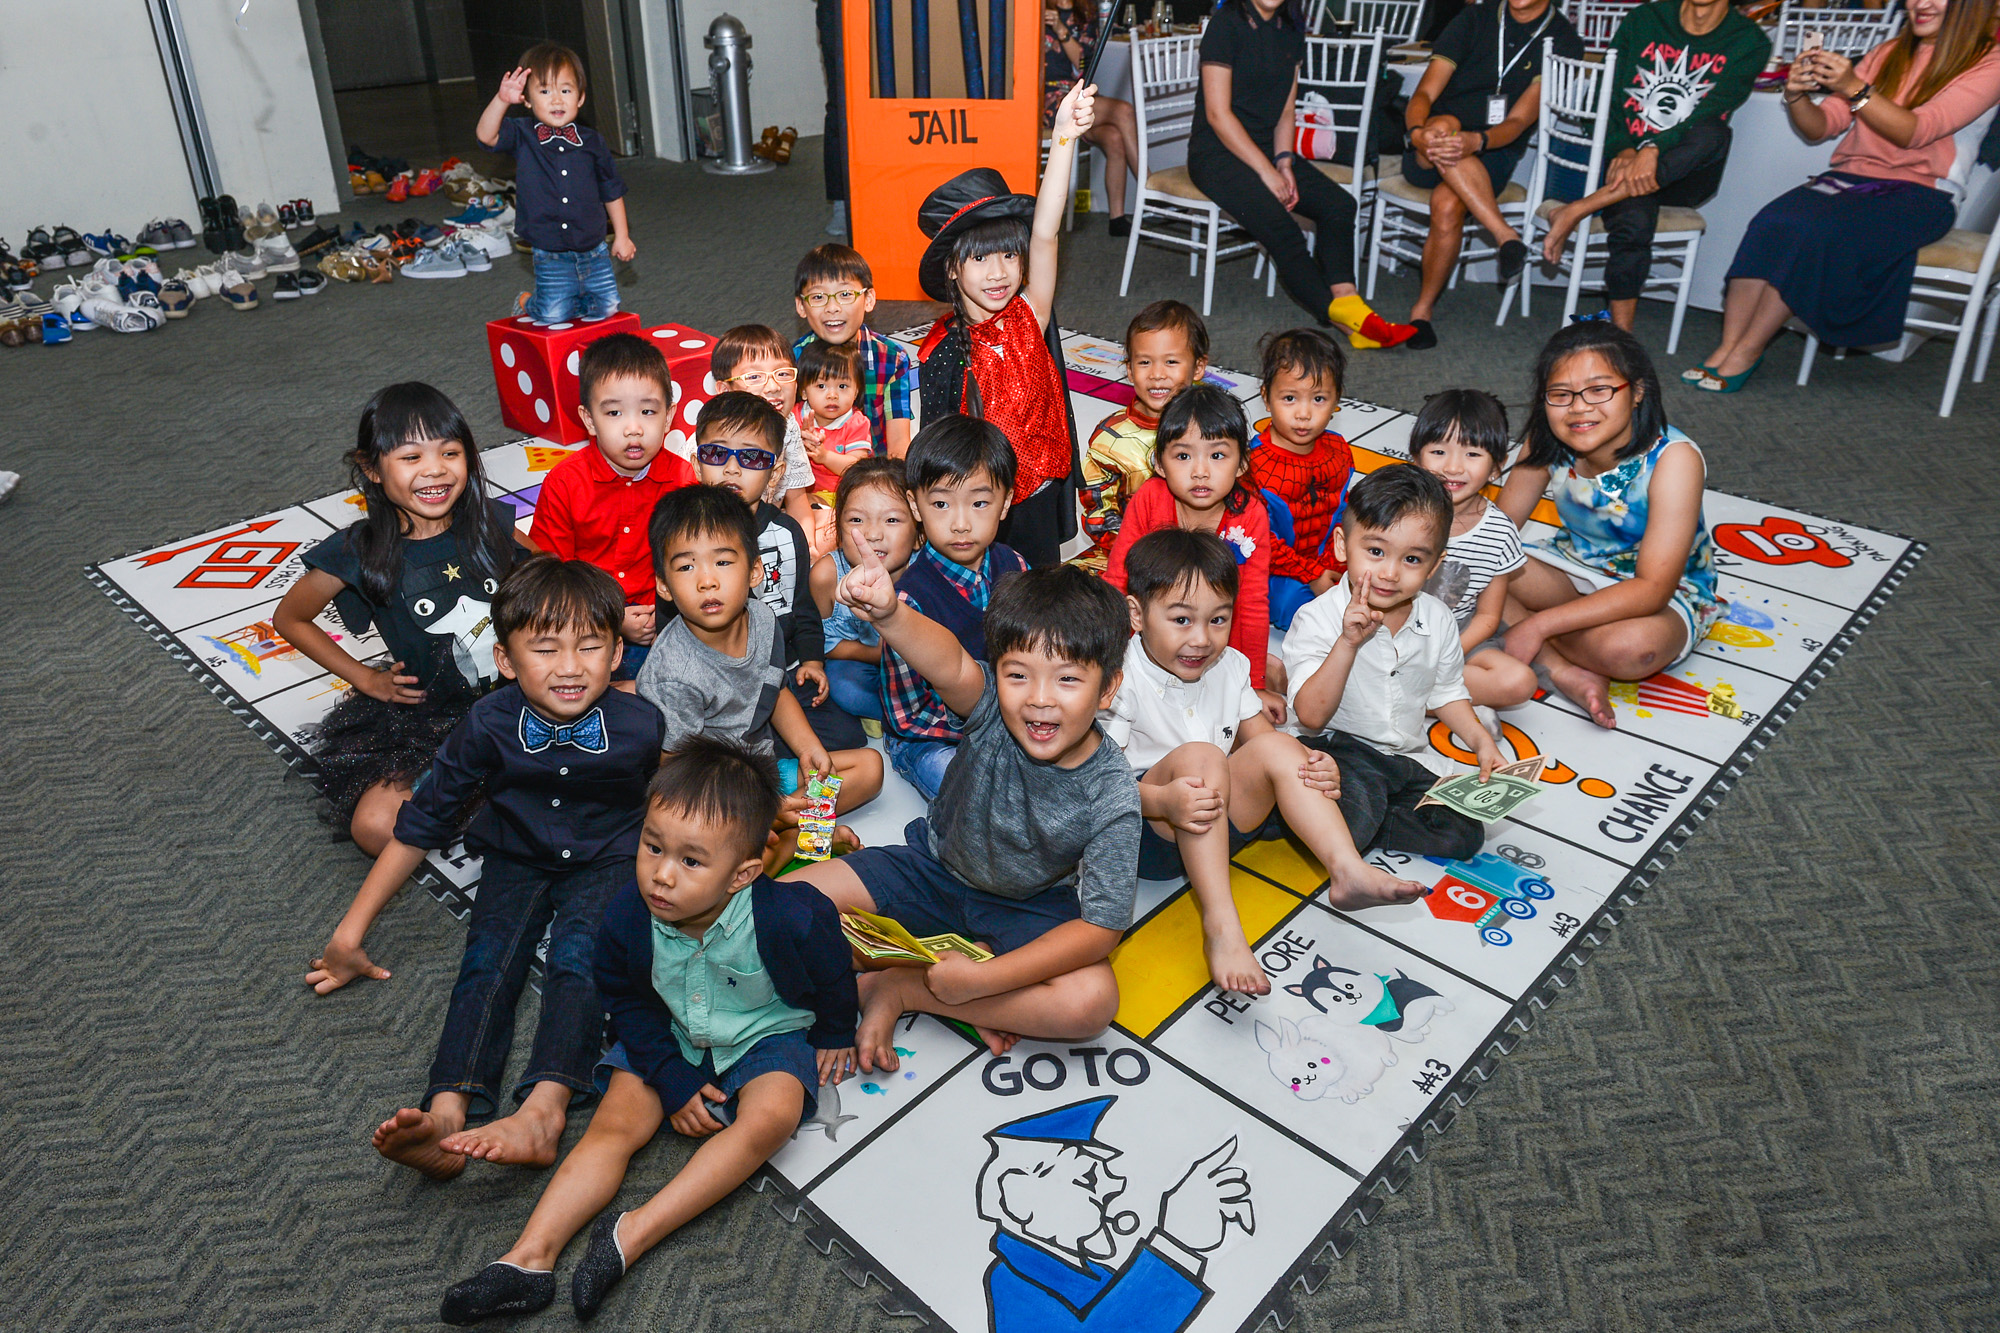 Kids on Game Board